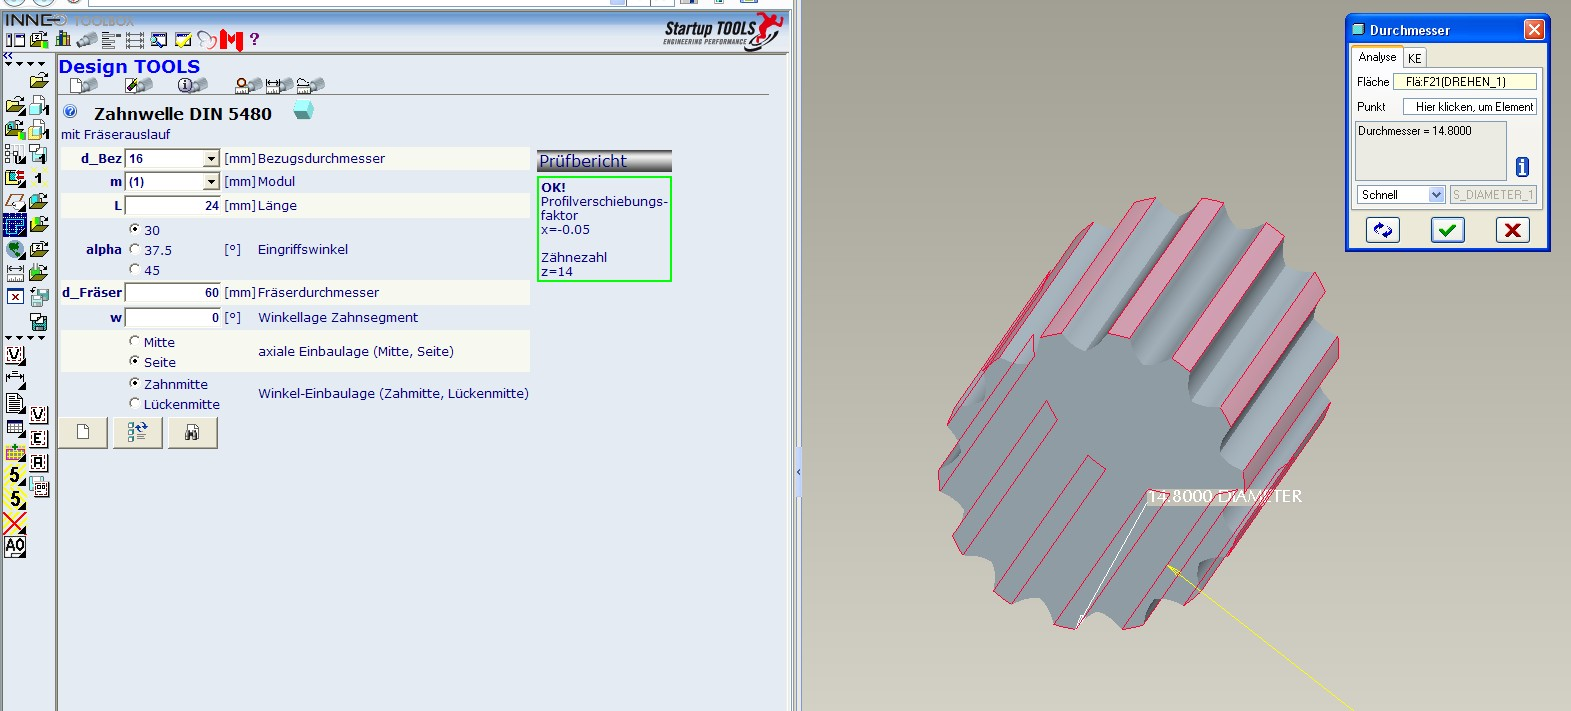 Passverzahnung DIN 5480  Fehler in den Design Tools  PTC Engineering SolutionsPro ENGINEER